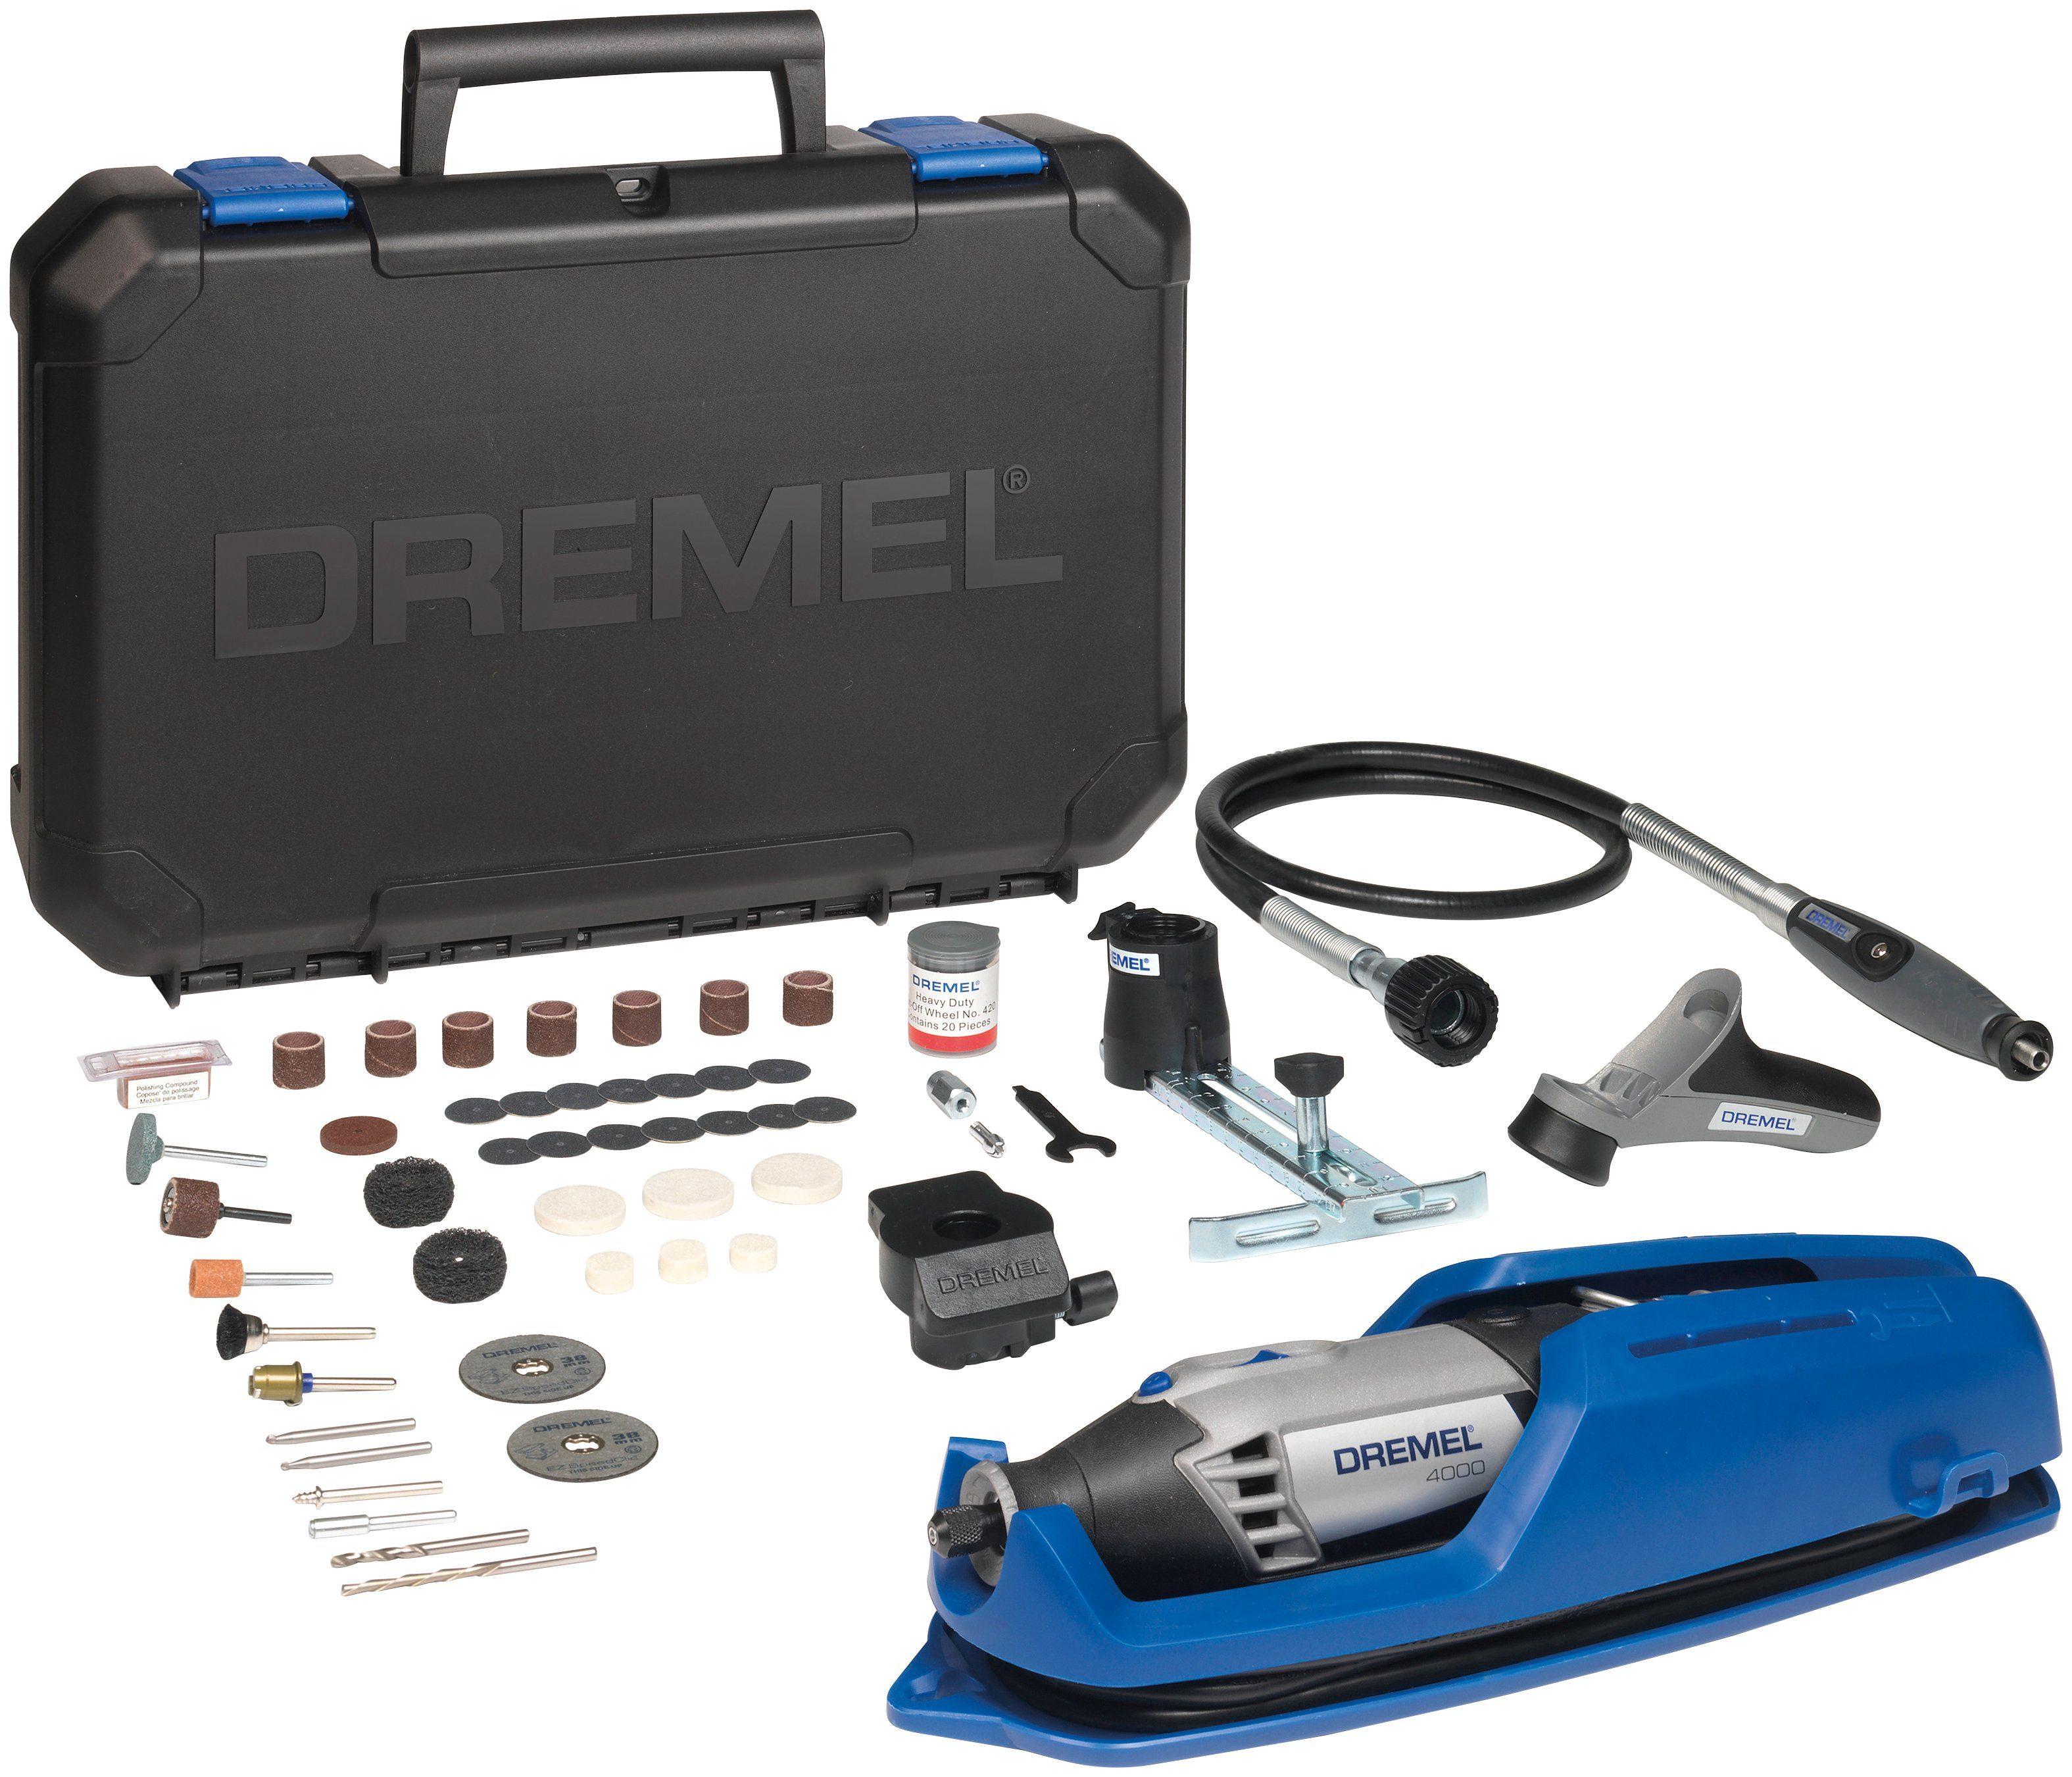 Dremel Multifunktionswerkzeug »DREMEL® 4000 (4000-4/65 EZ)«